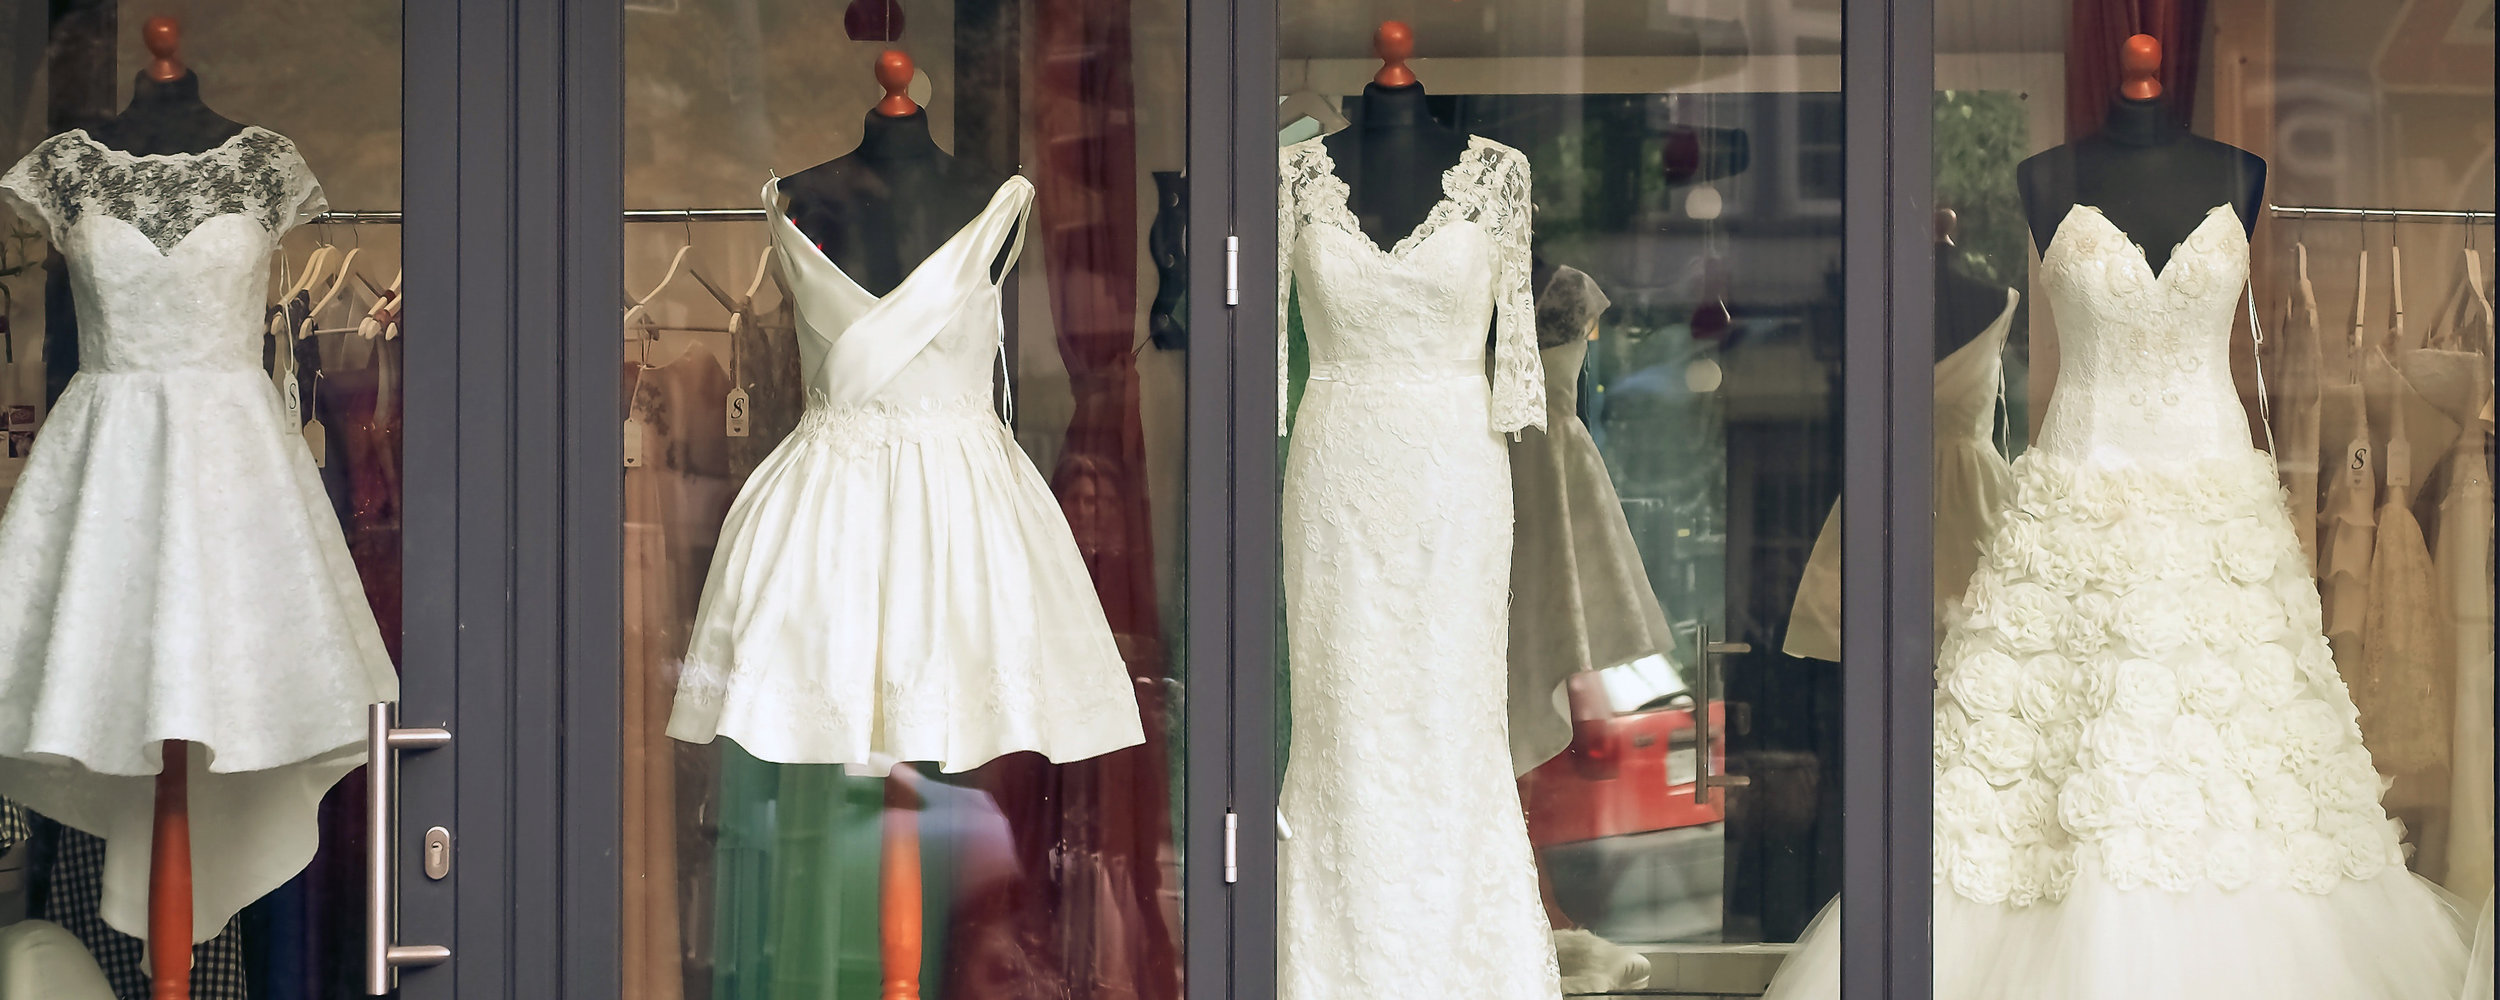 boutique-bridal-bridal-fashion-237432.jpg